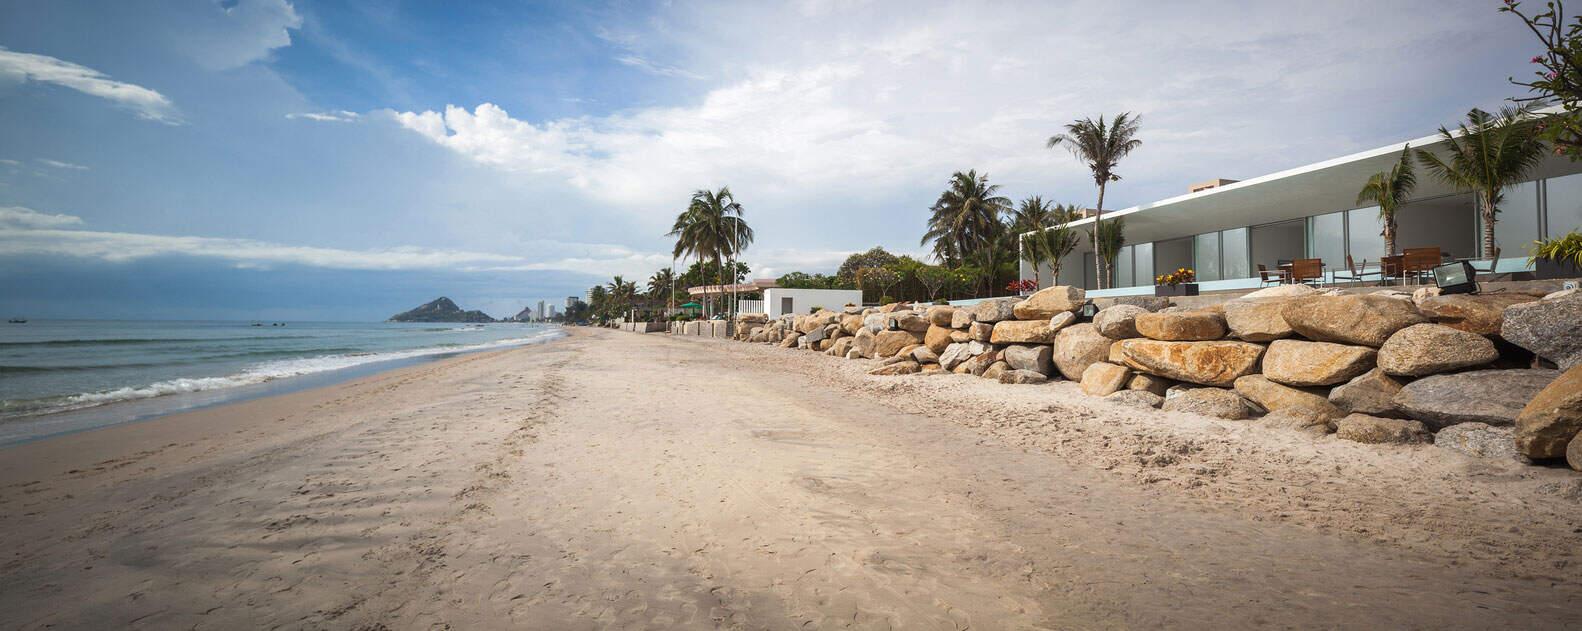 Seaside-Villa-01